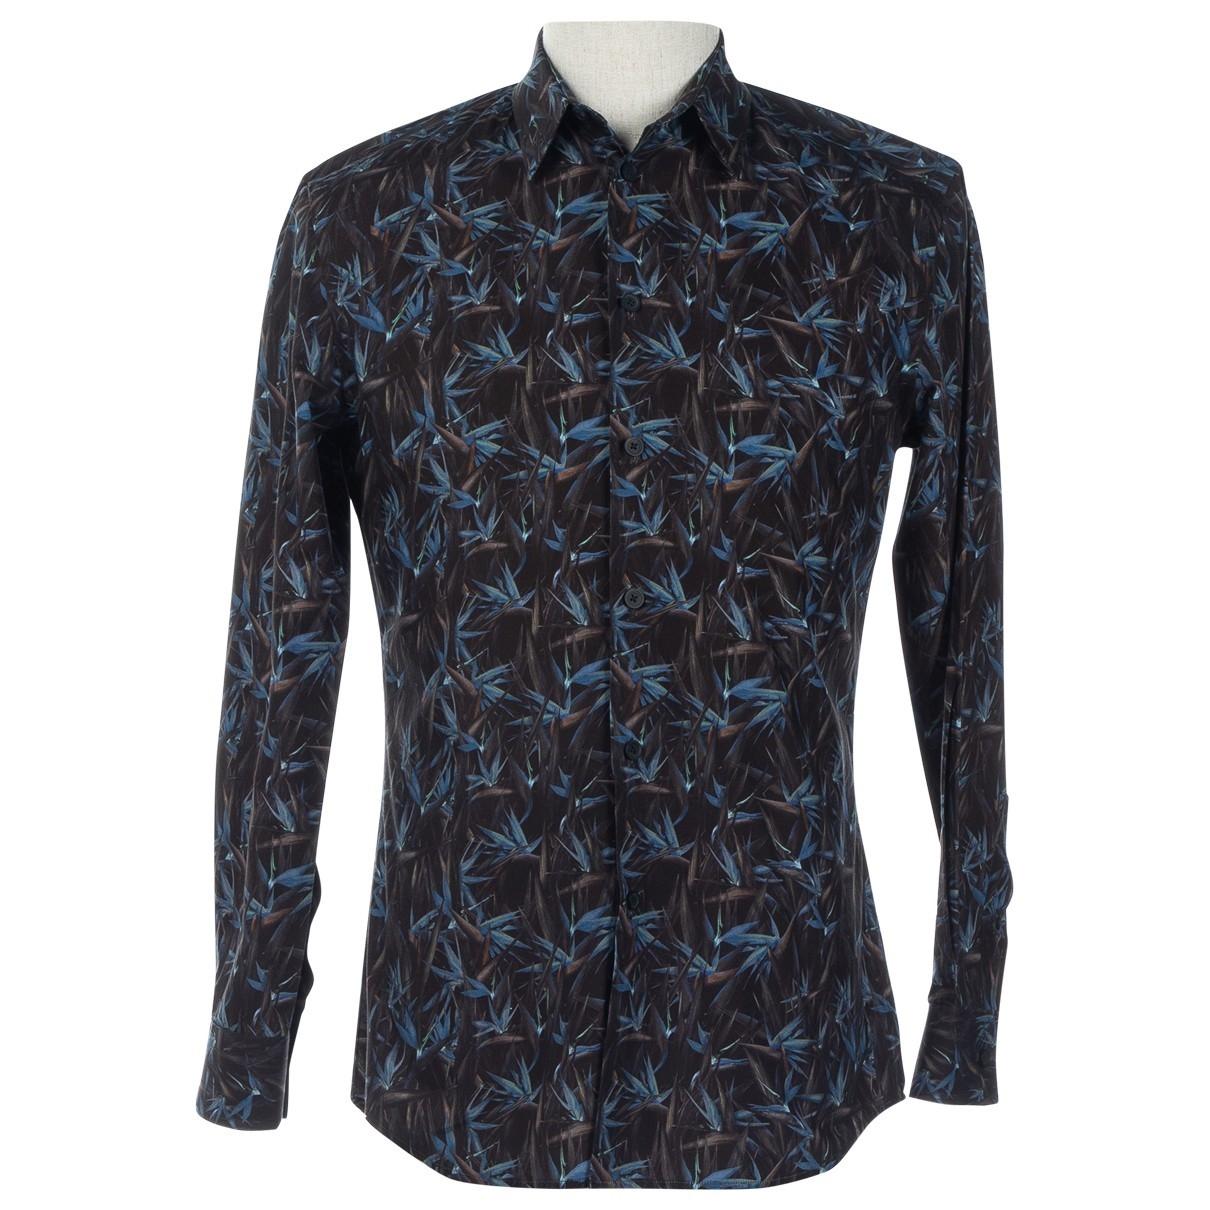 Givenchy \N Black Cotton Shirts for Men S International